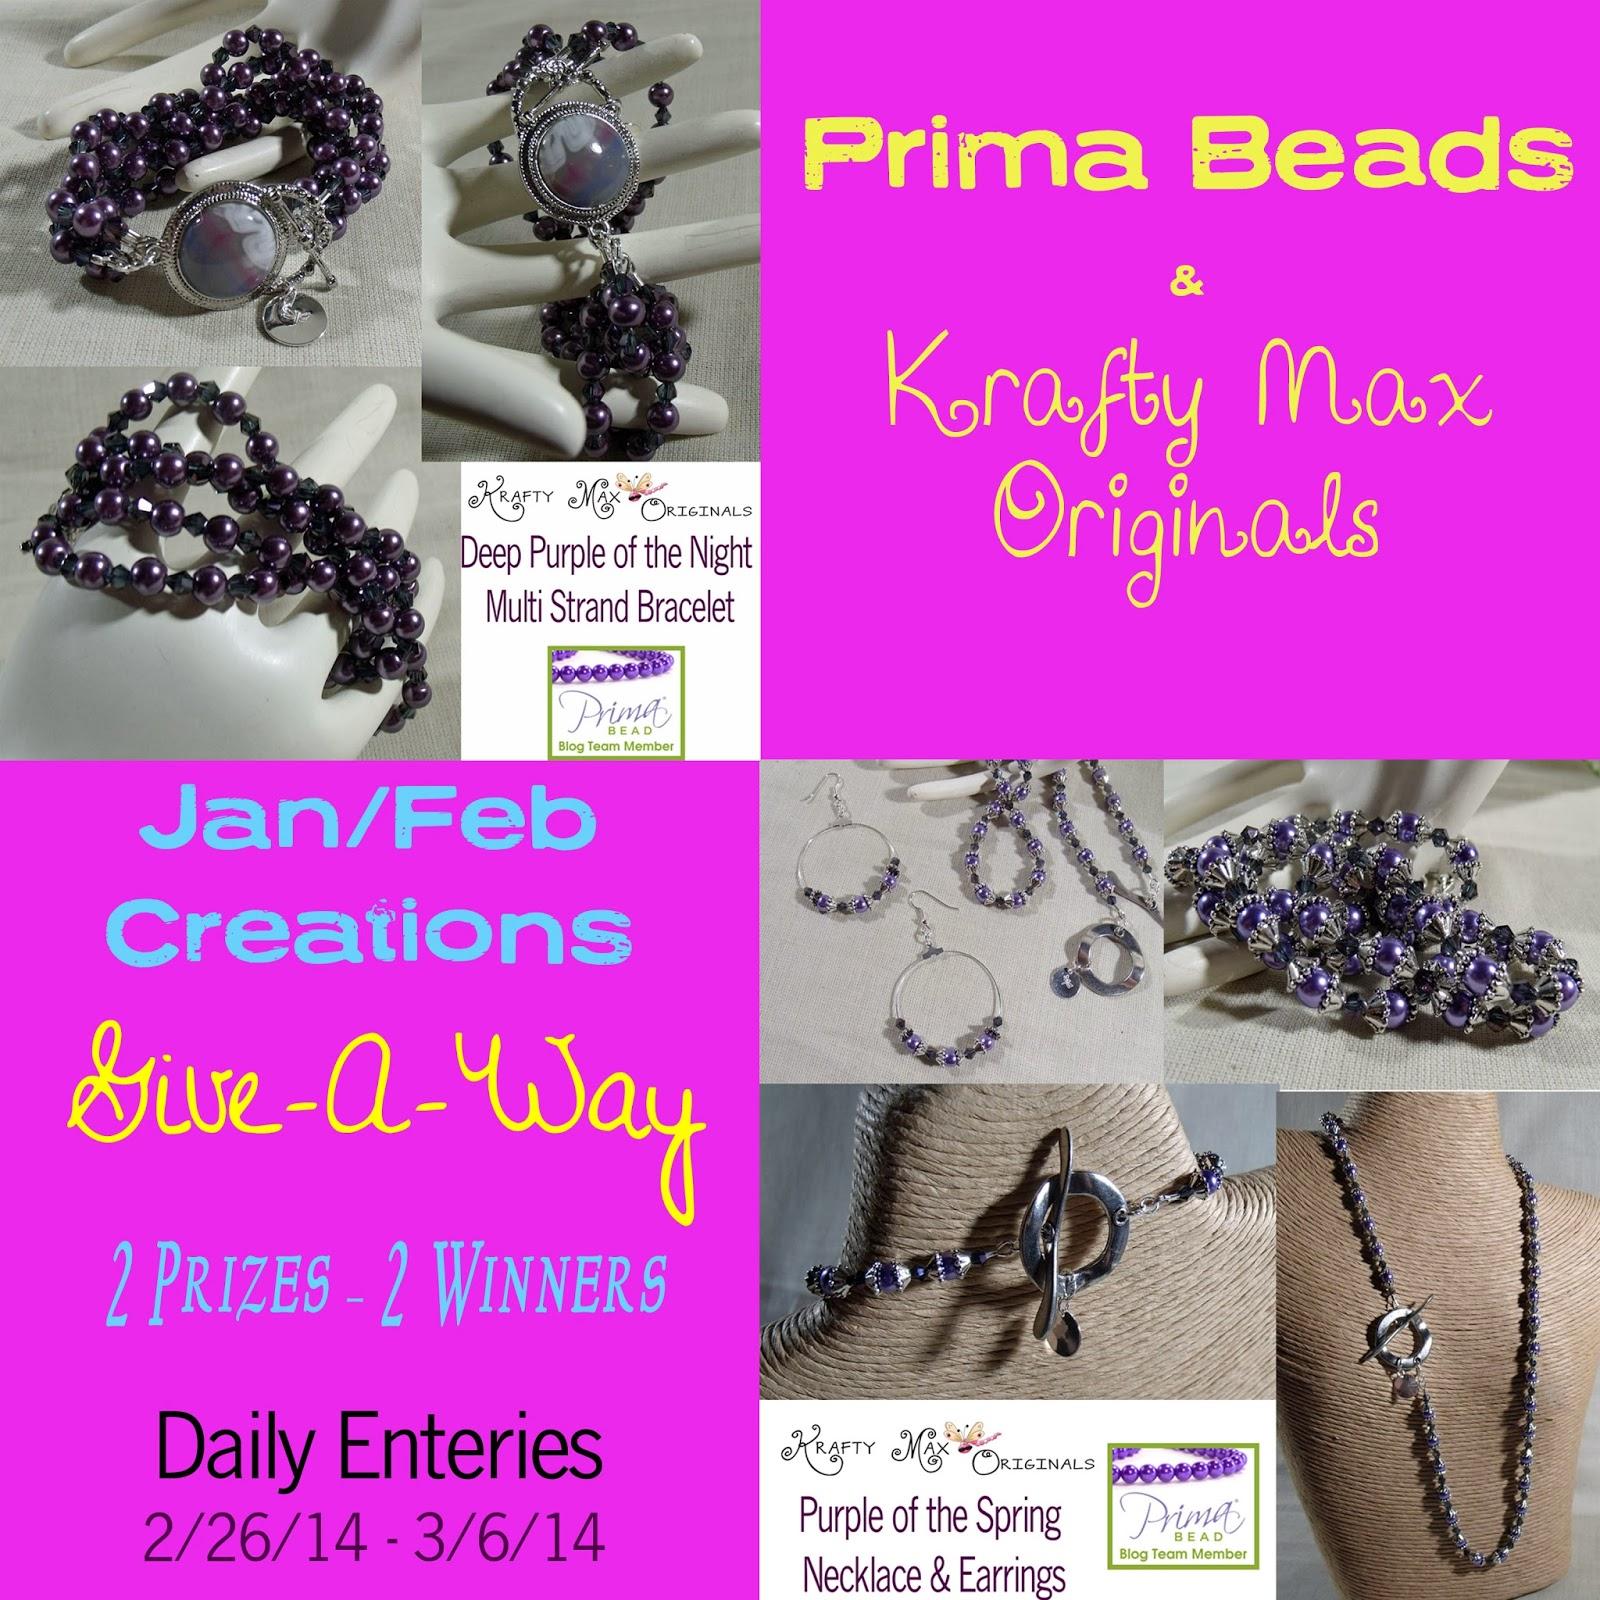 http://kraftymax.blogspot.com/2014/02/prima-beads-and-krafty-max-give-way.html